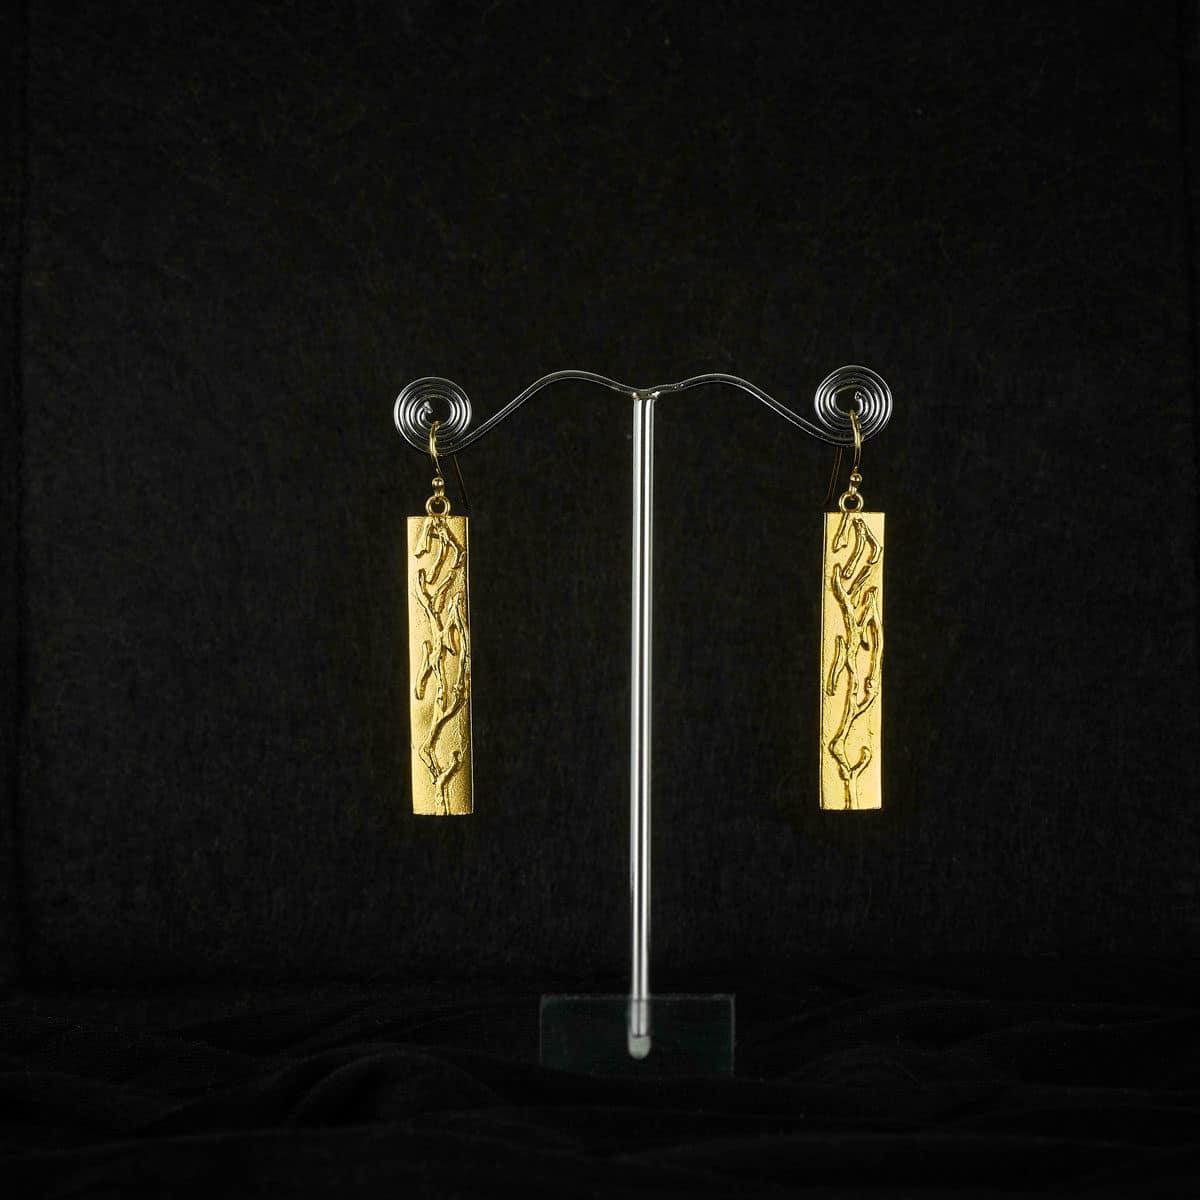 Pendientes de diseño modelo Outono, Joyería de diseño en plata. Joyas Siliva.